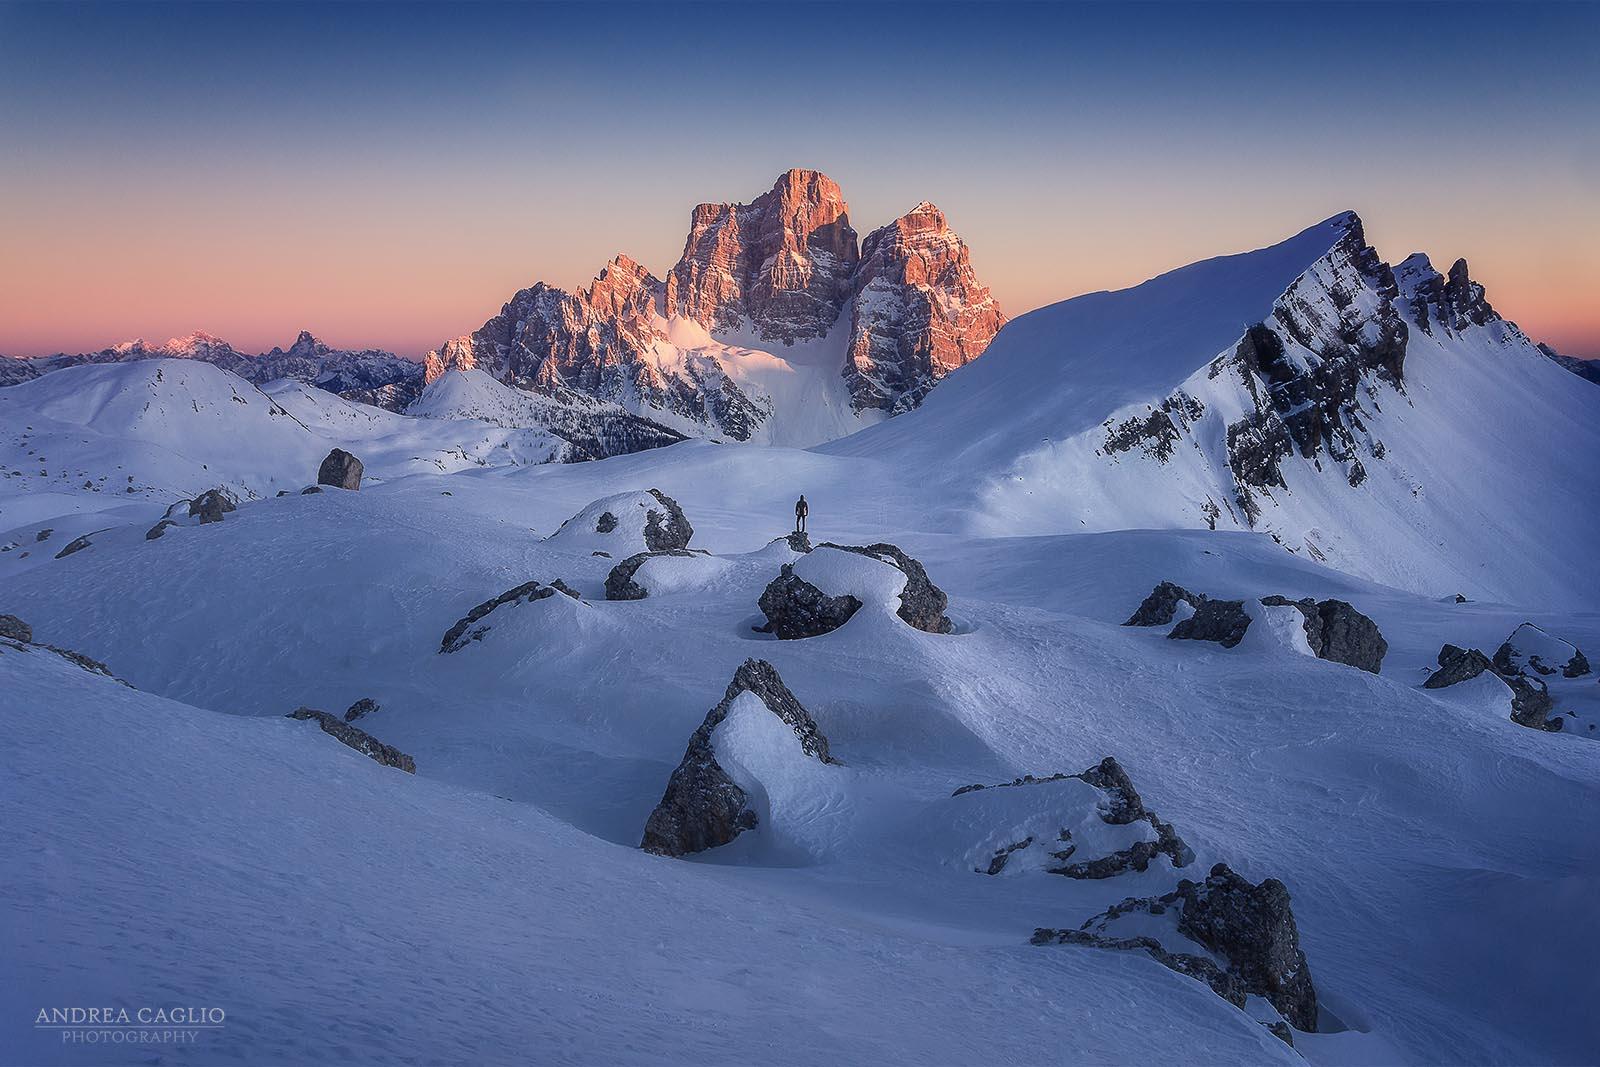 Andrea Caglio photography winter dolomites gallery